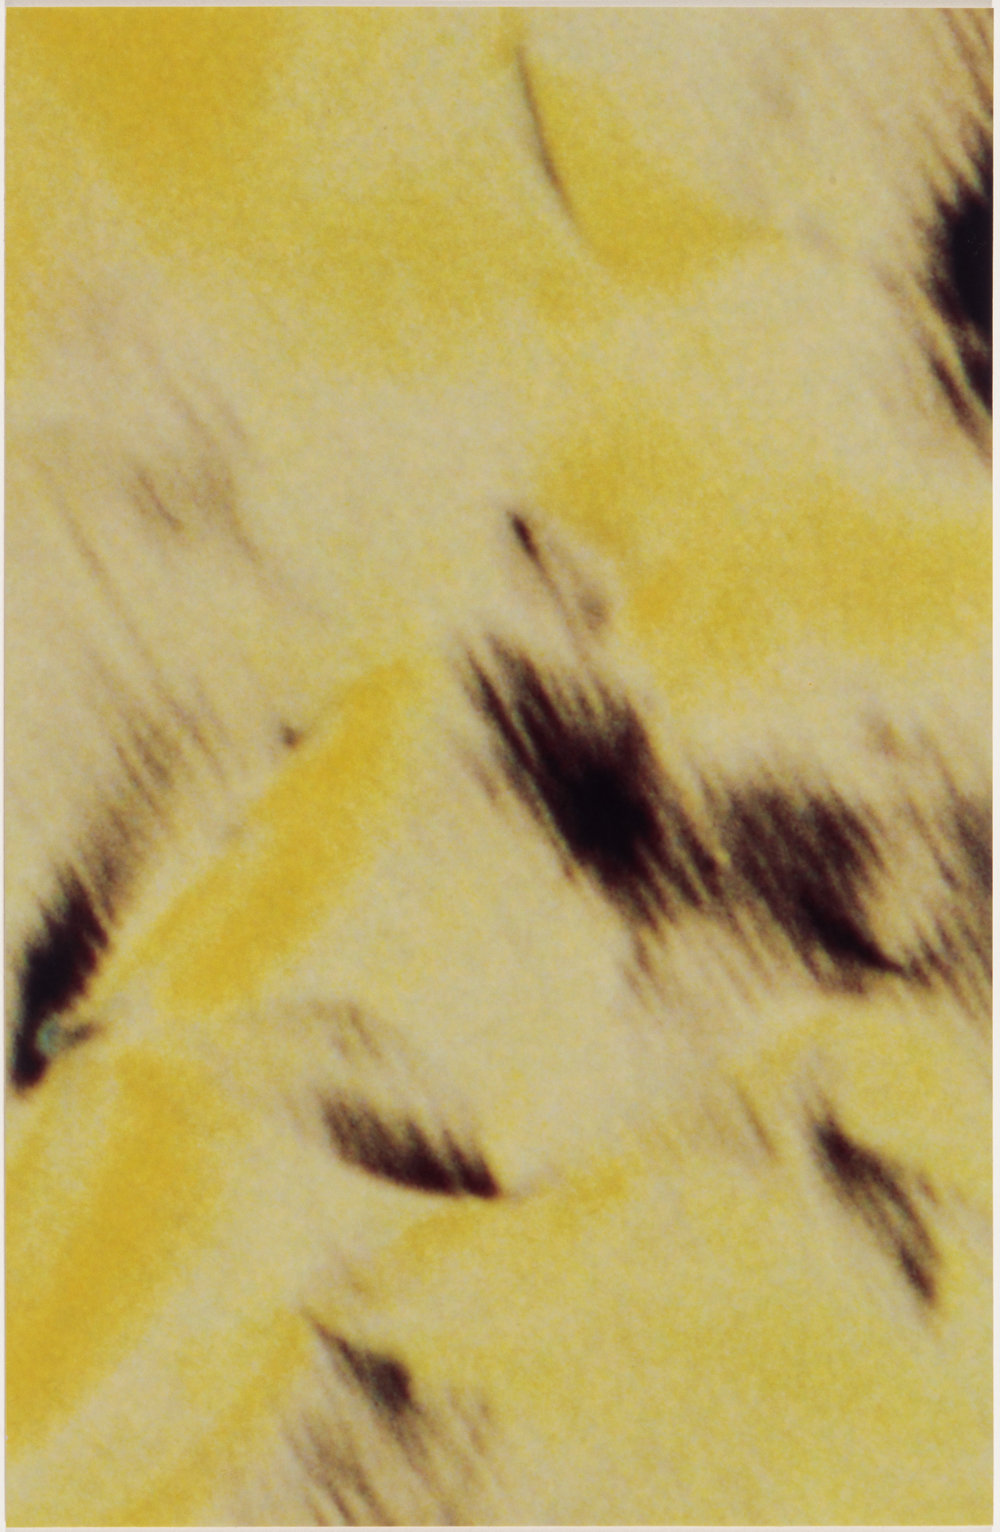 Carol Szymanski, %22Cavatina 1c: Weapons on Hand,%22 2017, 4.3 x 2.8 inches, Cibachrome unique print.jpg